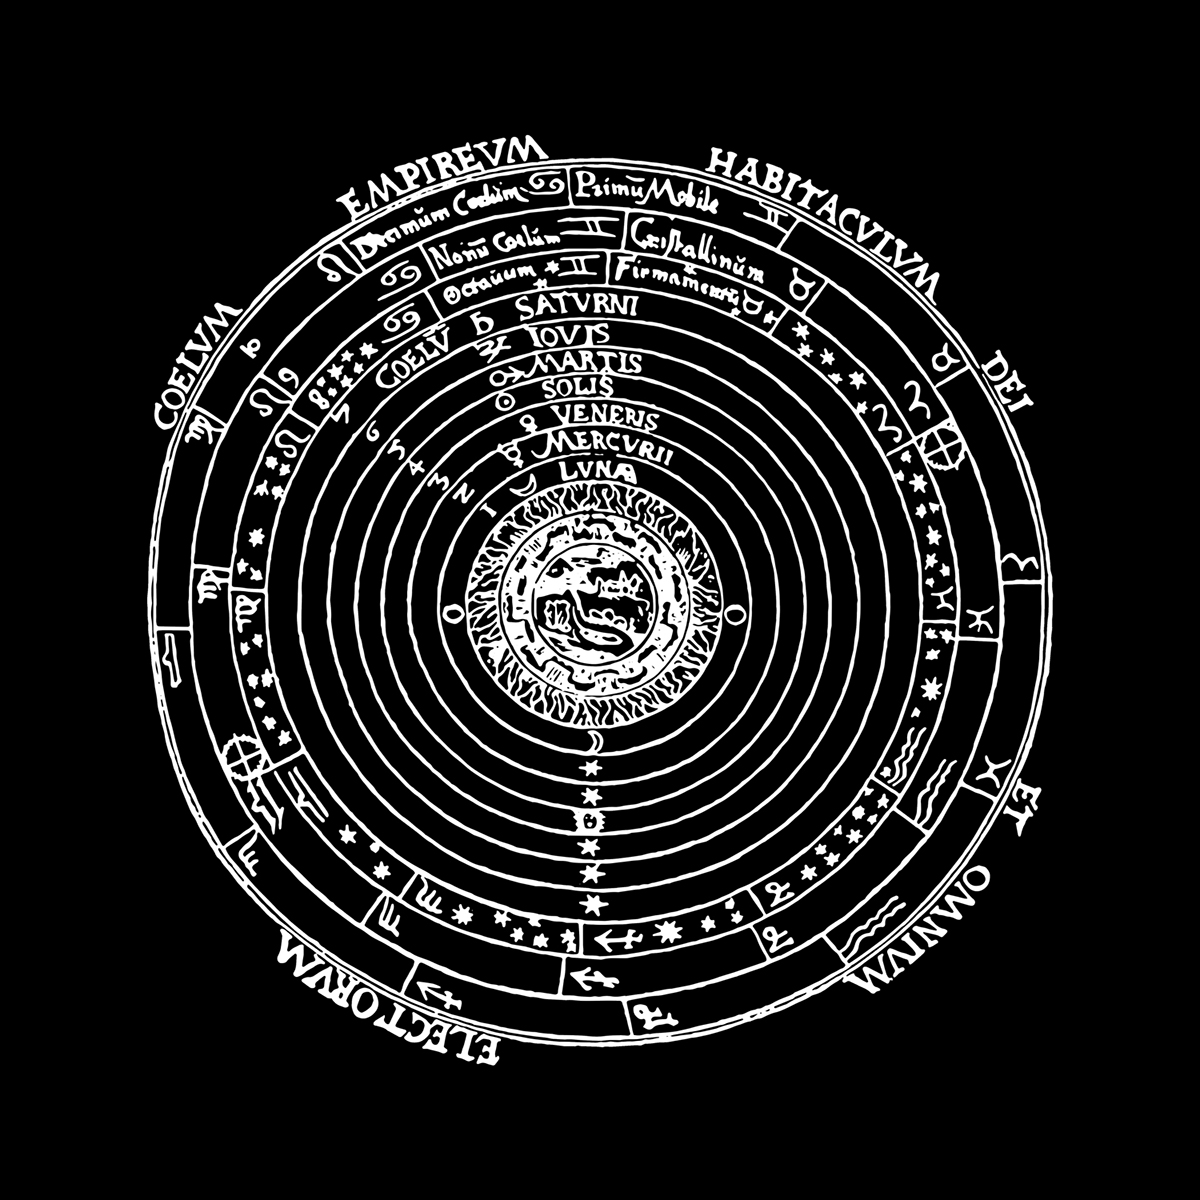 Hashed Out Cosmic Pessimism Montreal vinyl long play Hardcore punk DIY L'Œil du tigre Jeremy Cohen